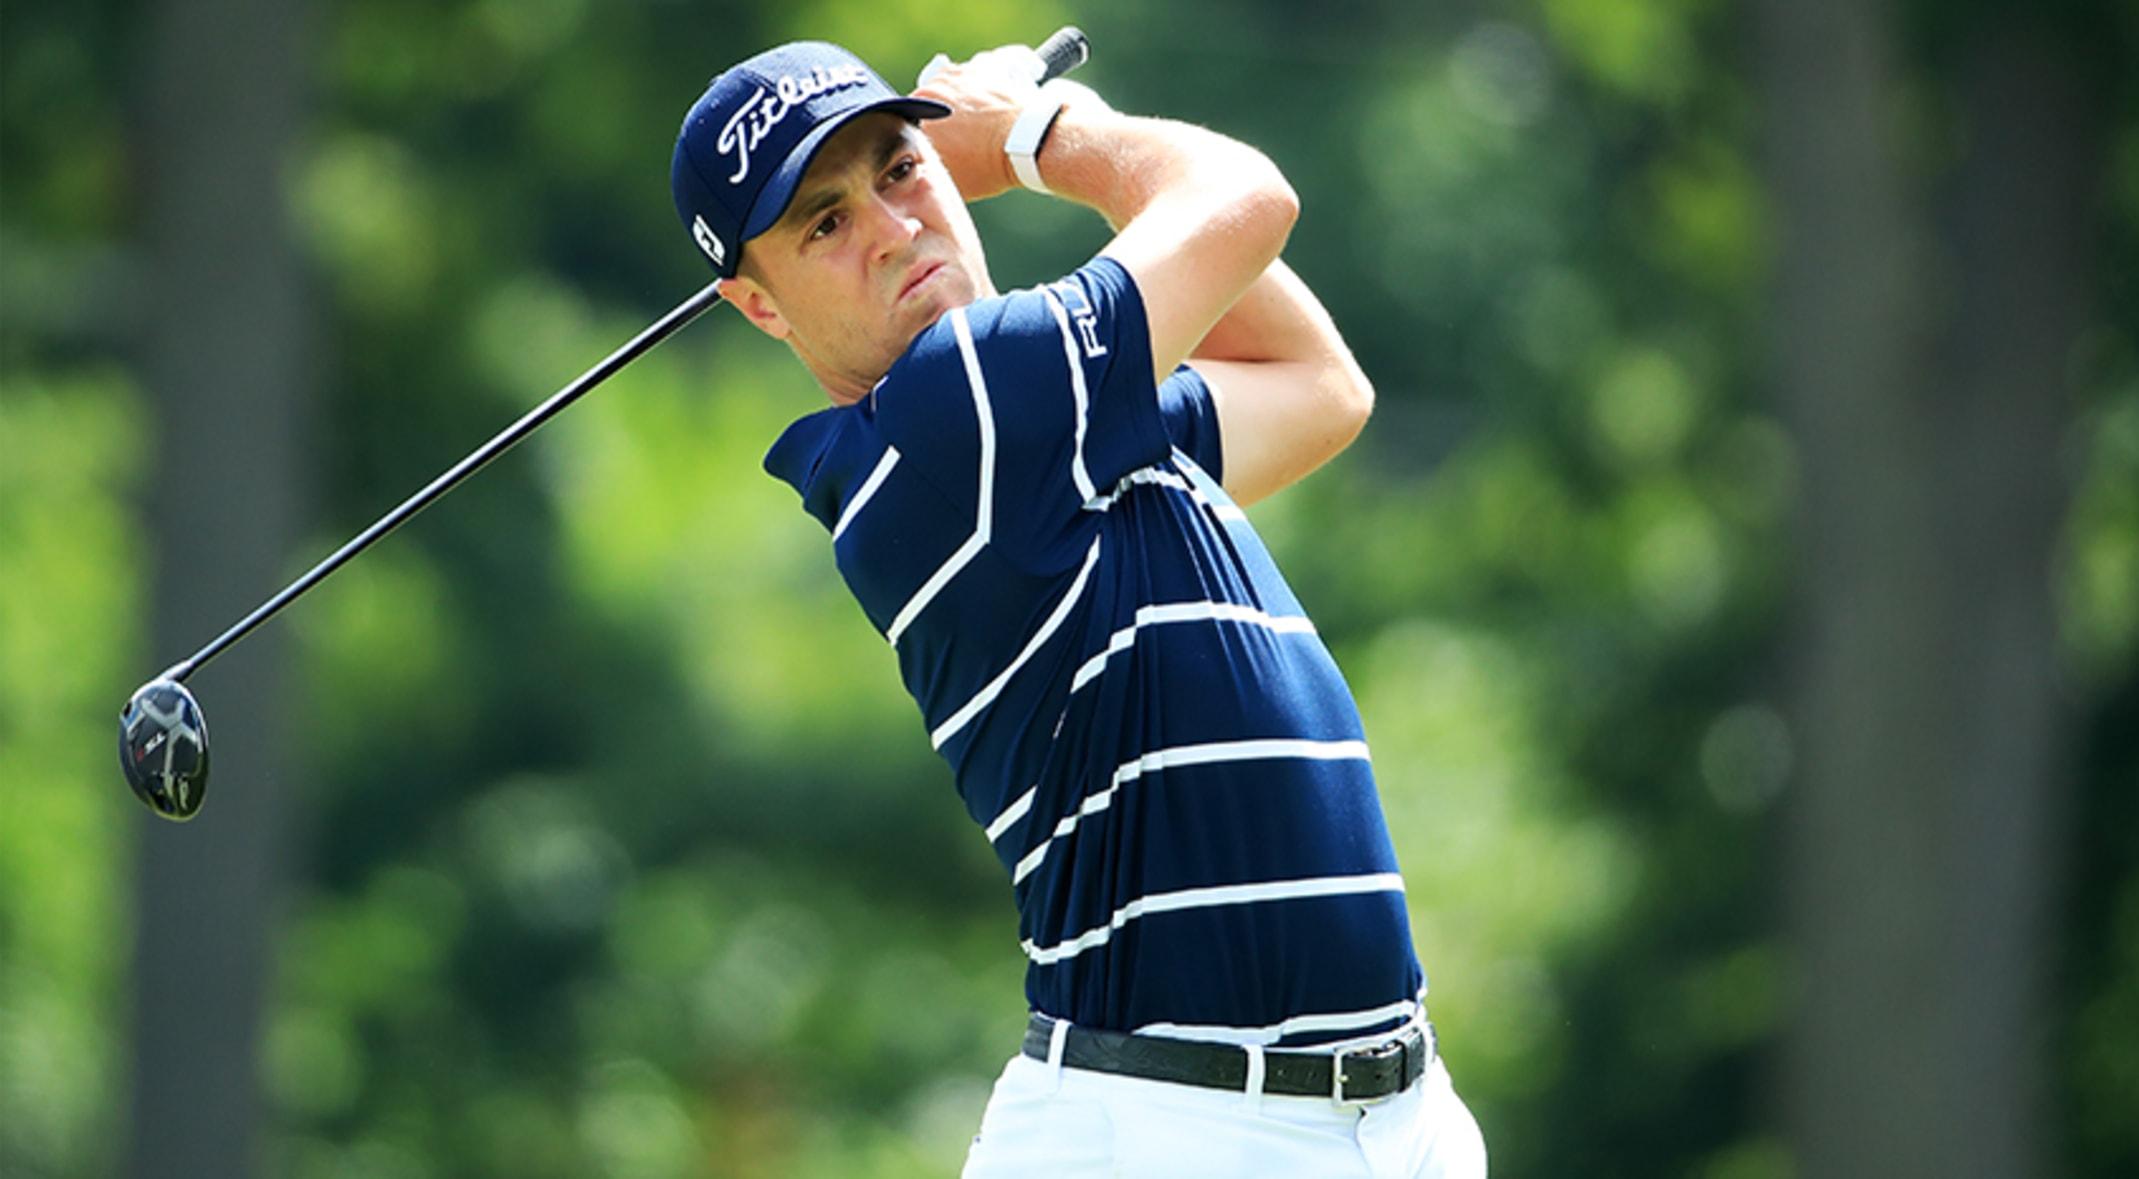 Style Insider Fall 2019 Polo Ralph Lauren Golf Rlx Golf Collections